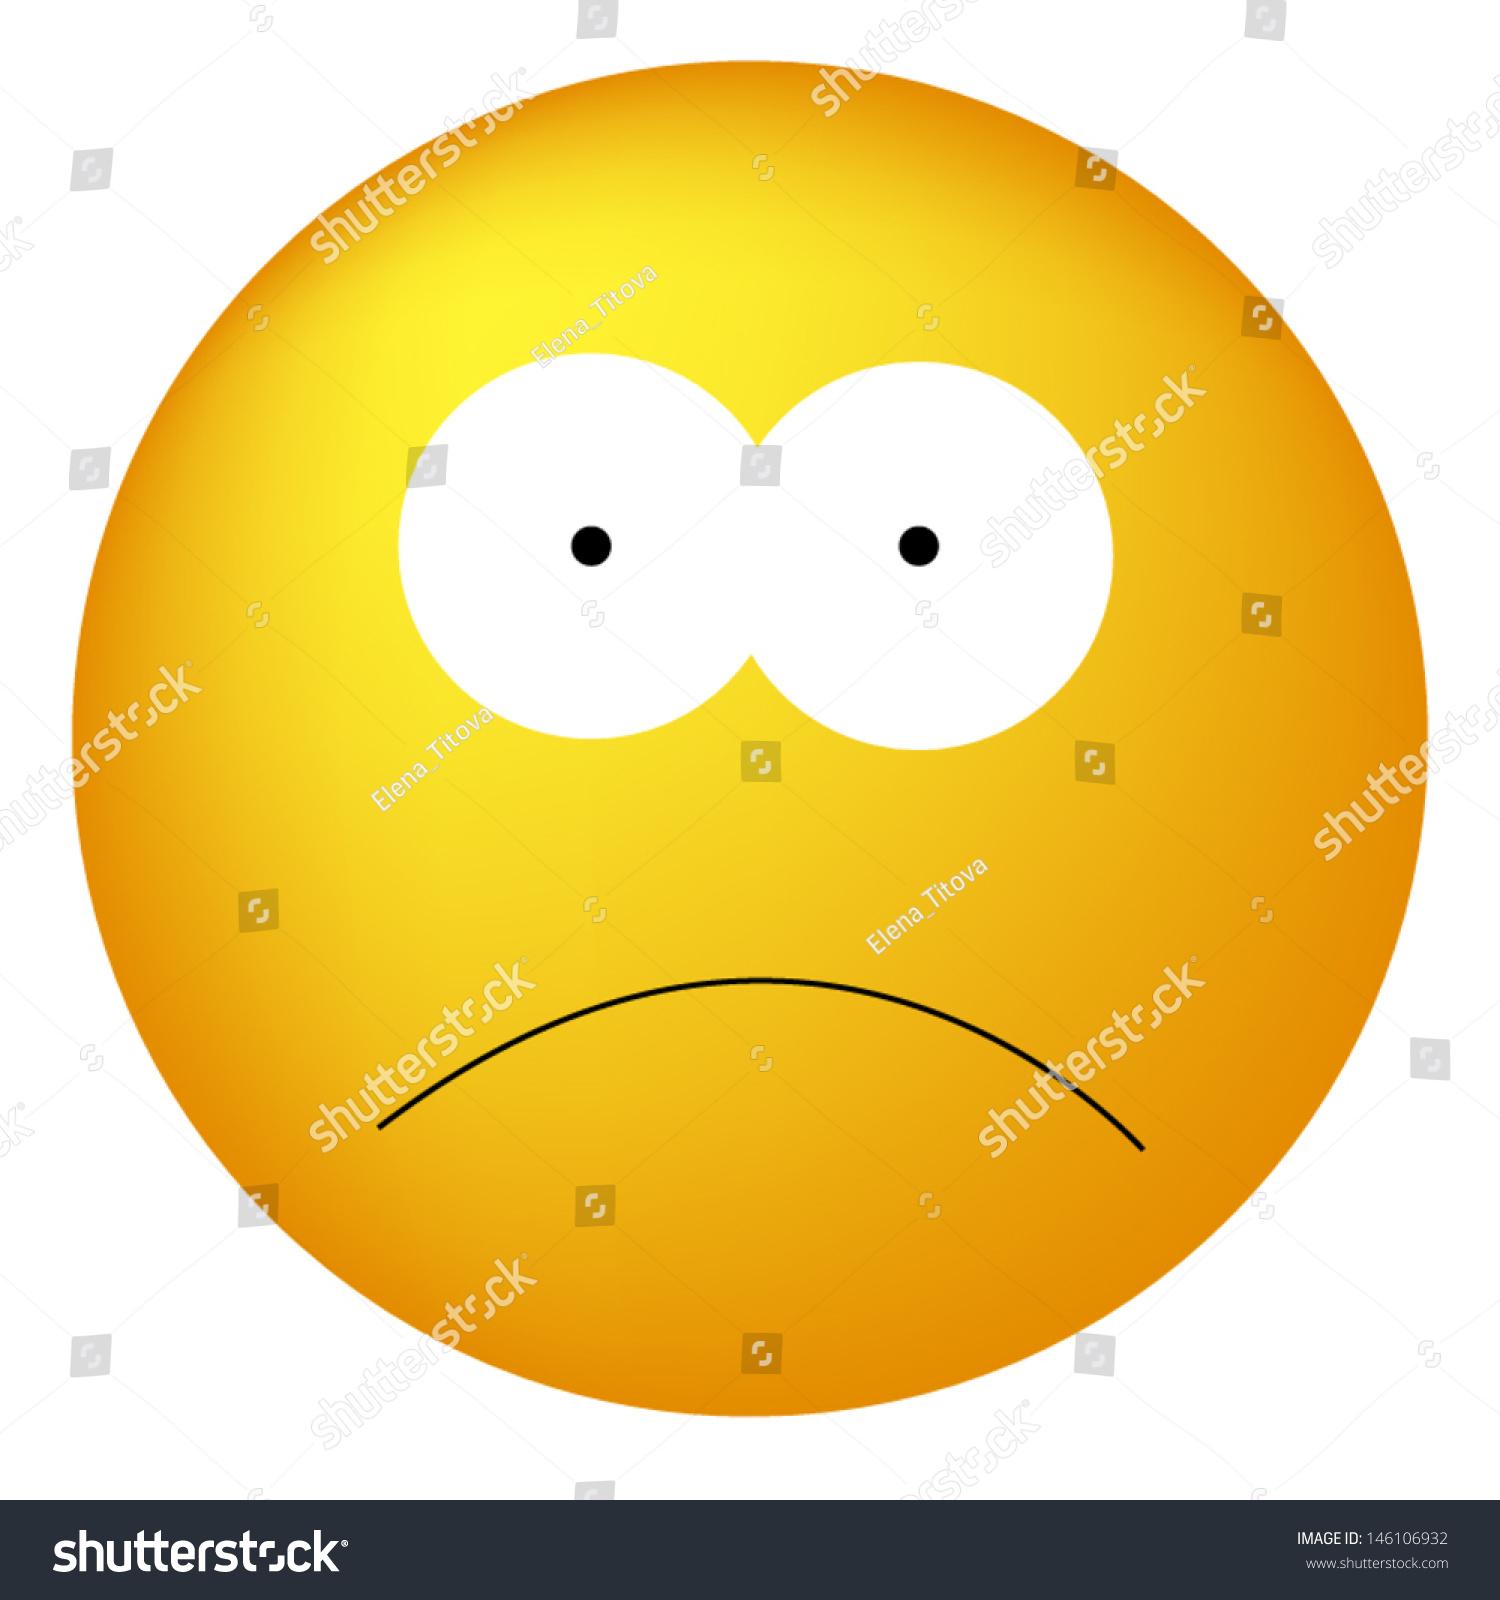 Sad Smiley Face Stock Vector 146106932 - Shutterstock